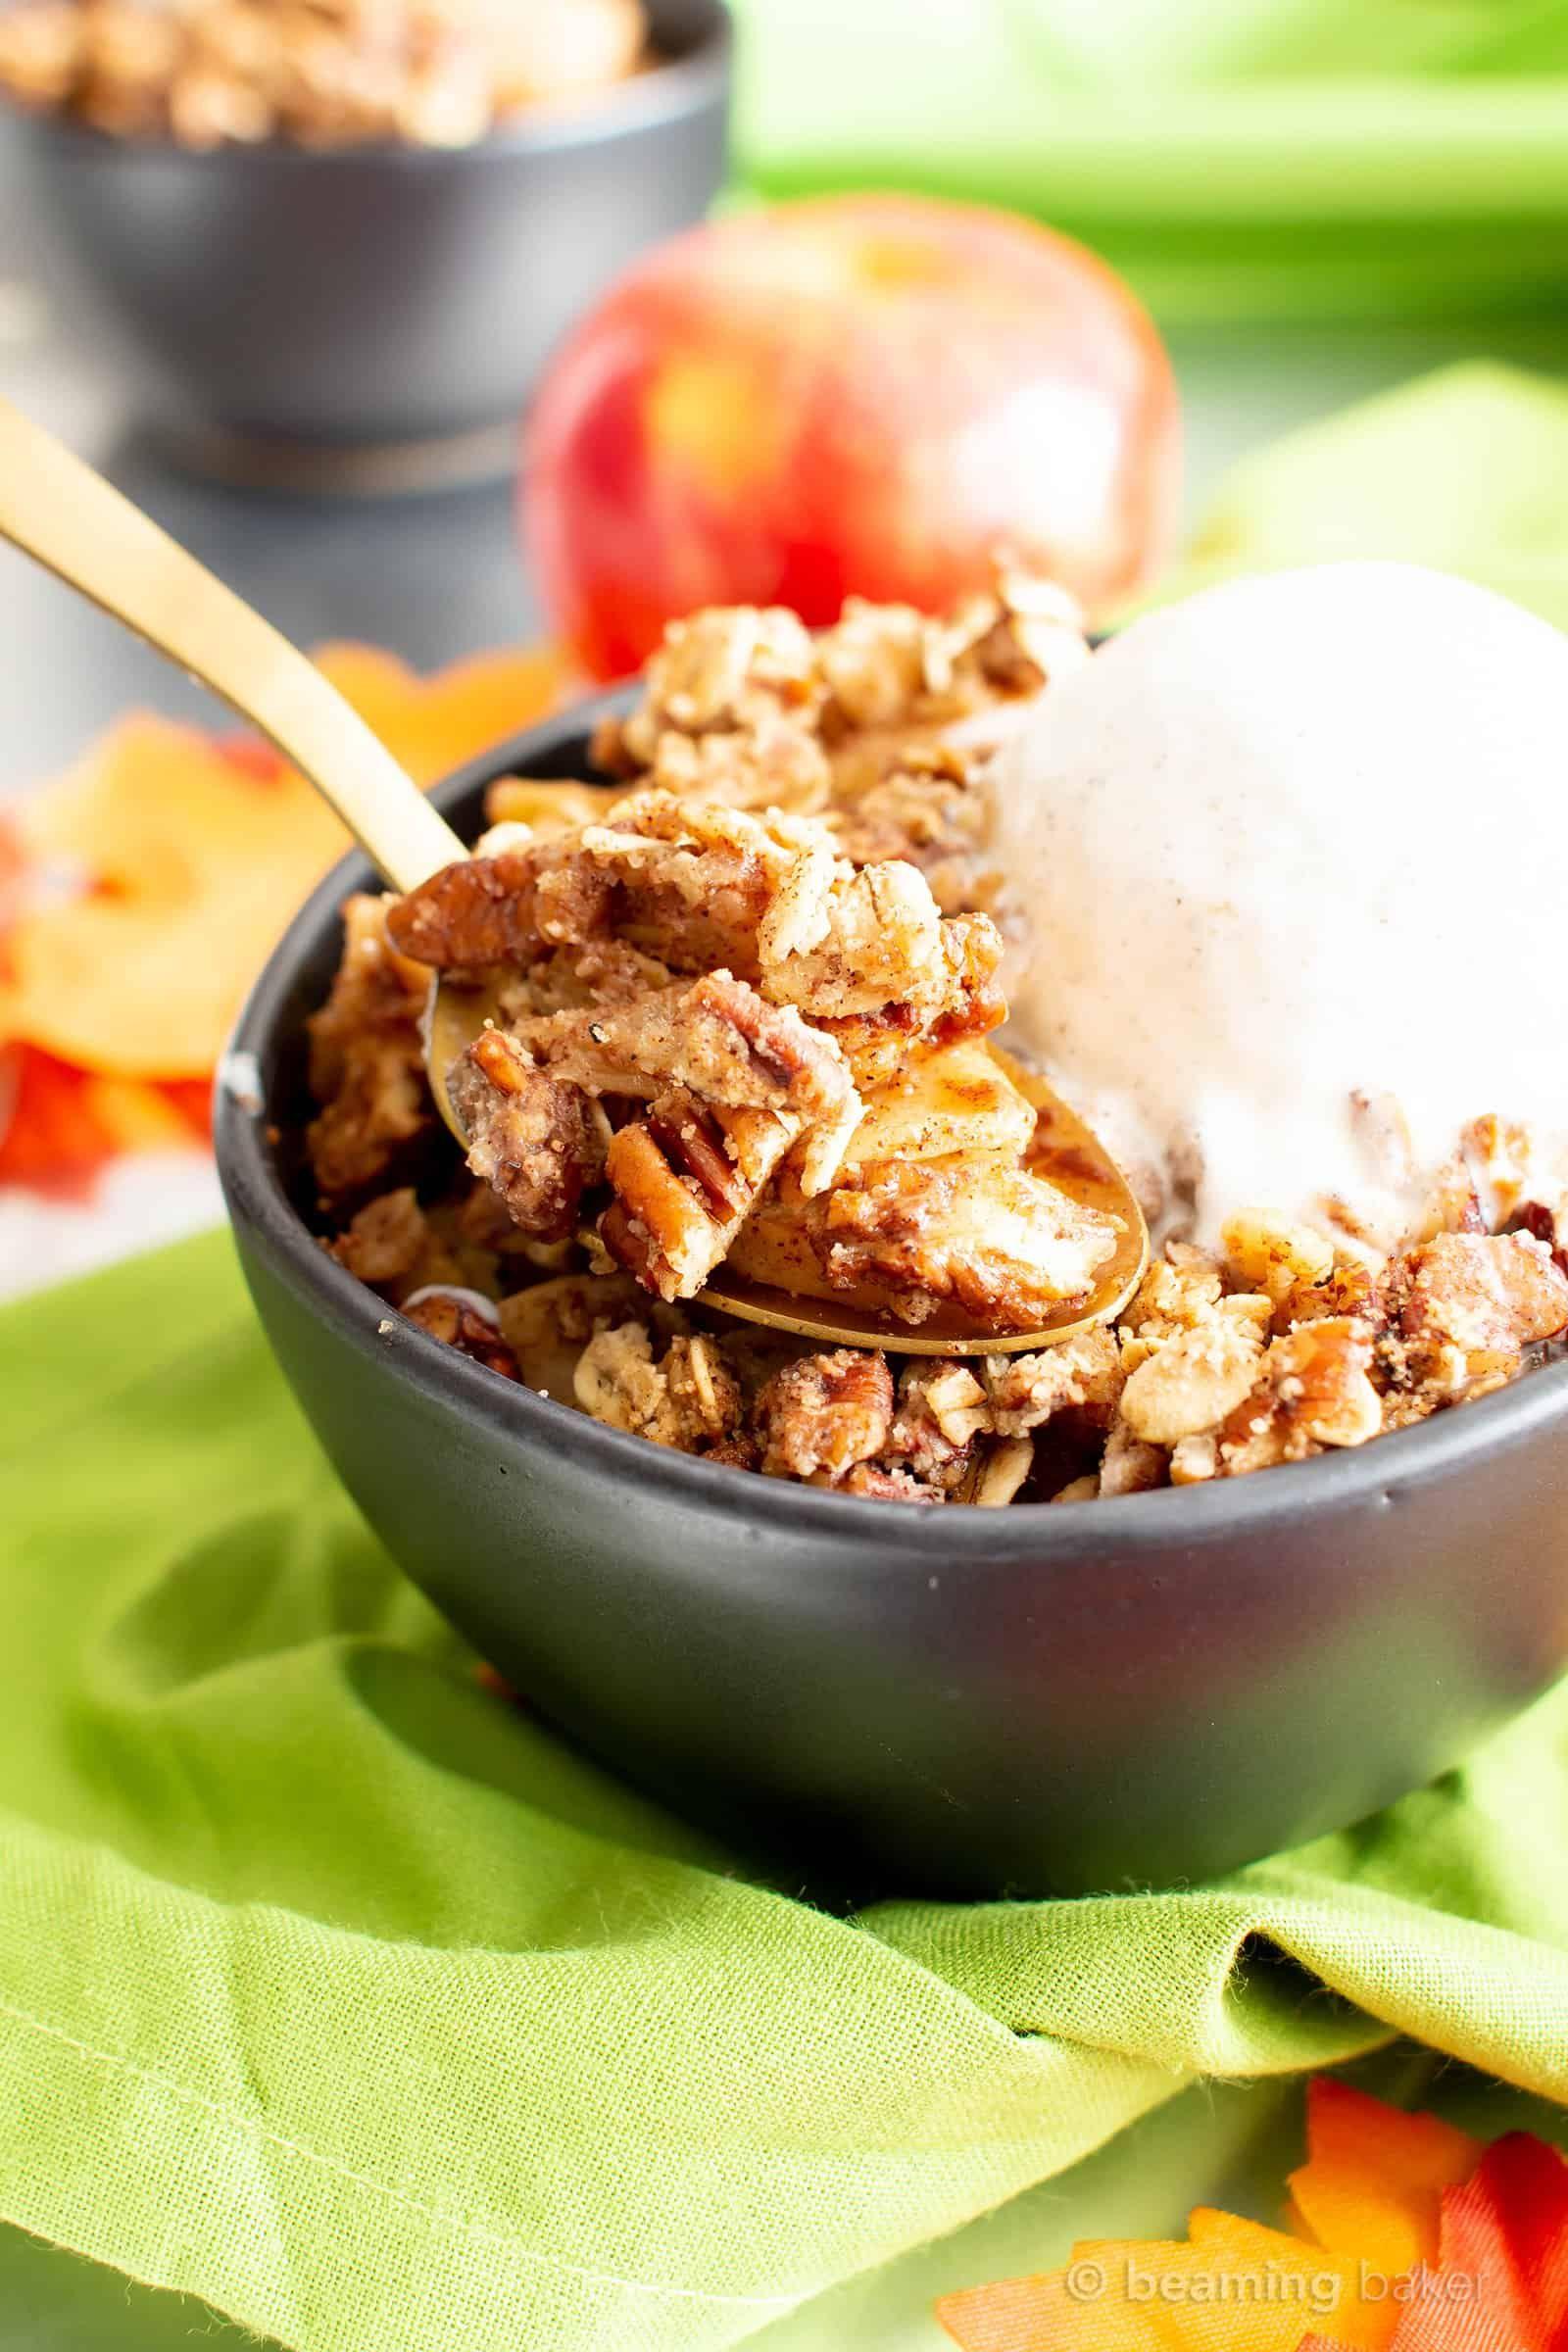 Vegan Gluten Free Cinnamon Apple Crisp with Oats (V, GF